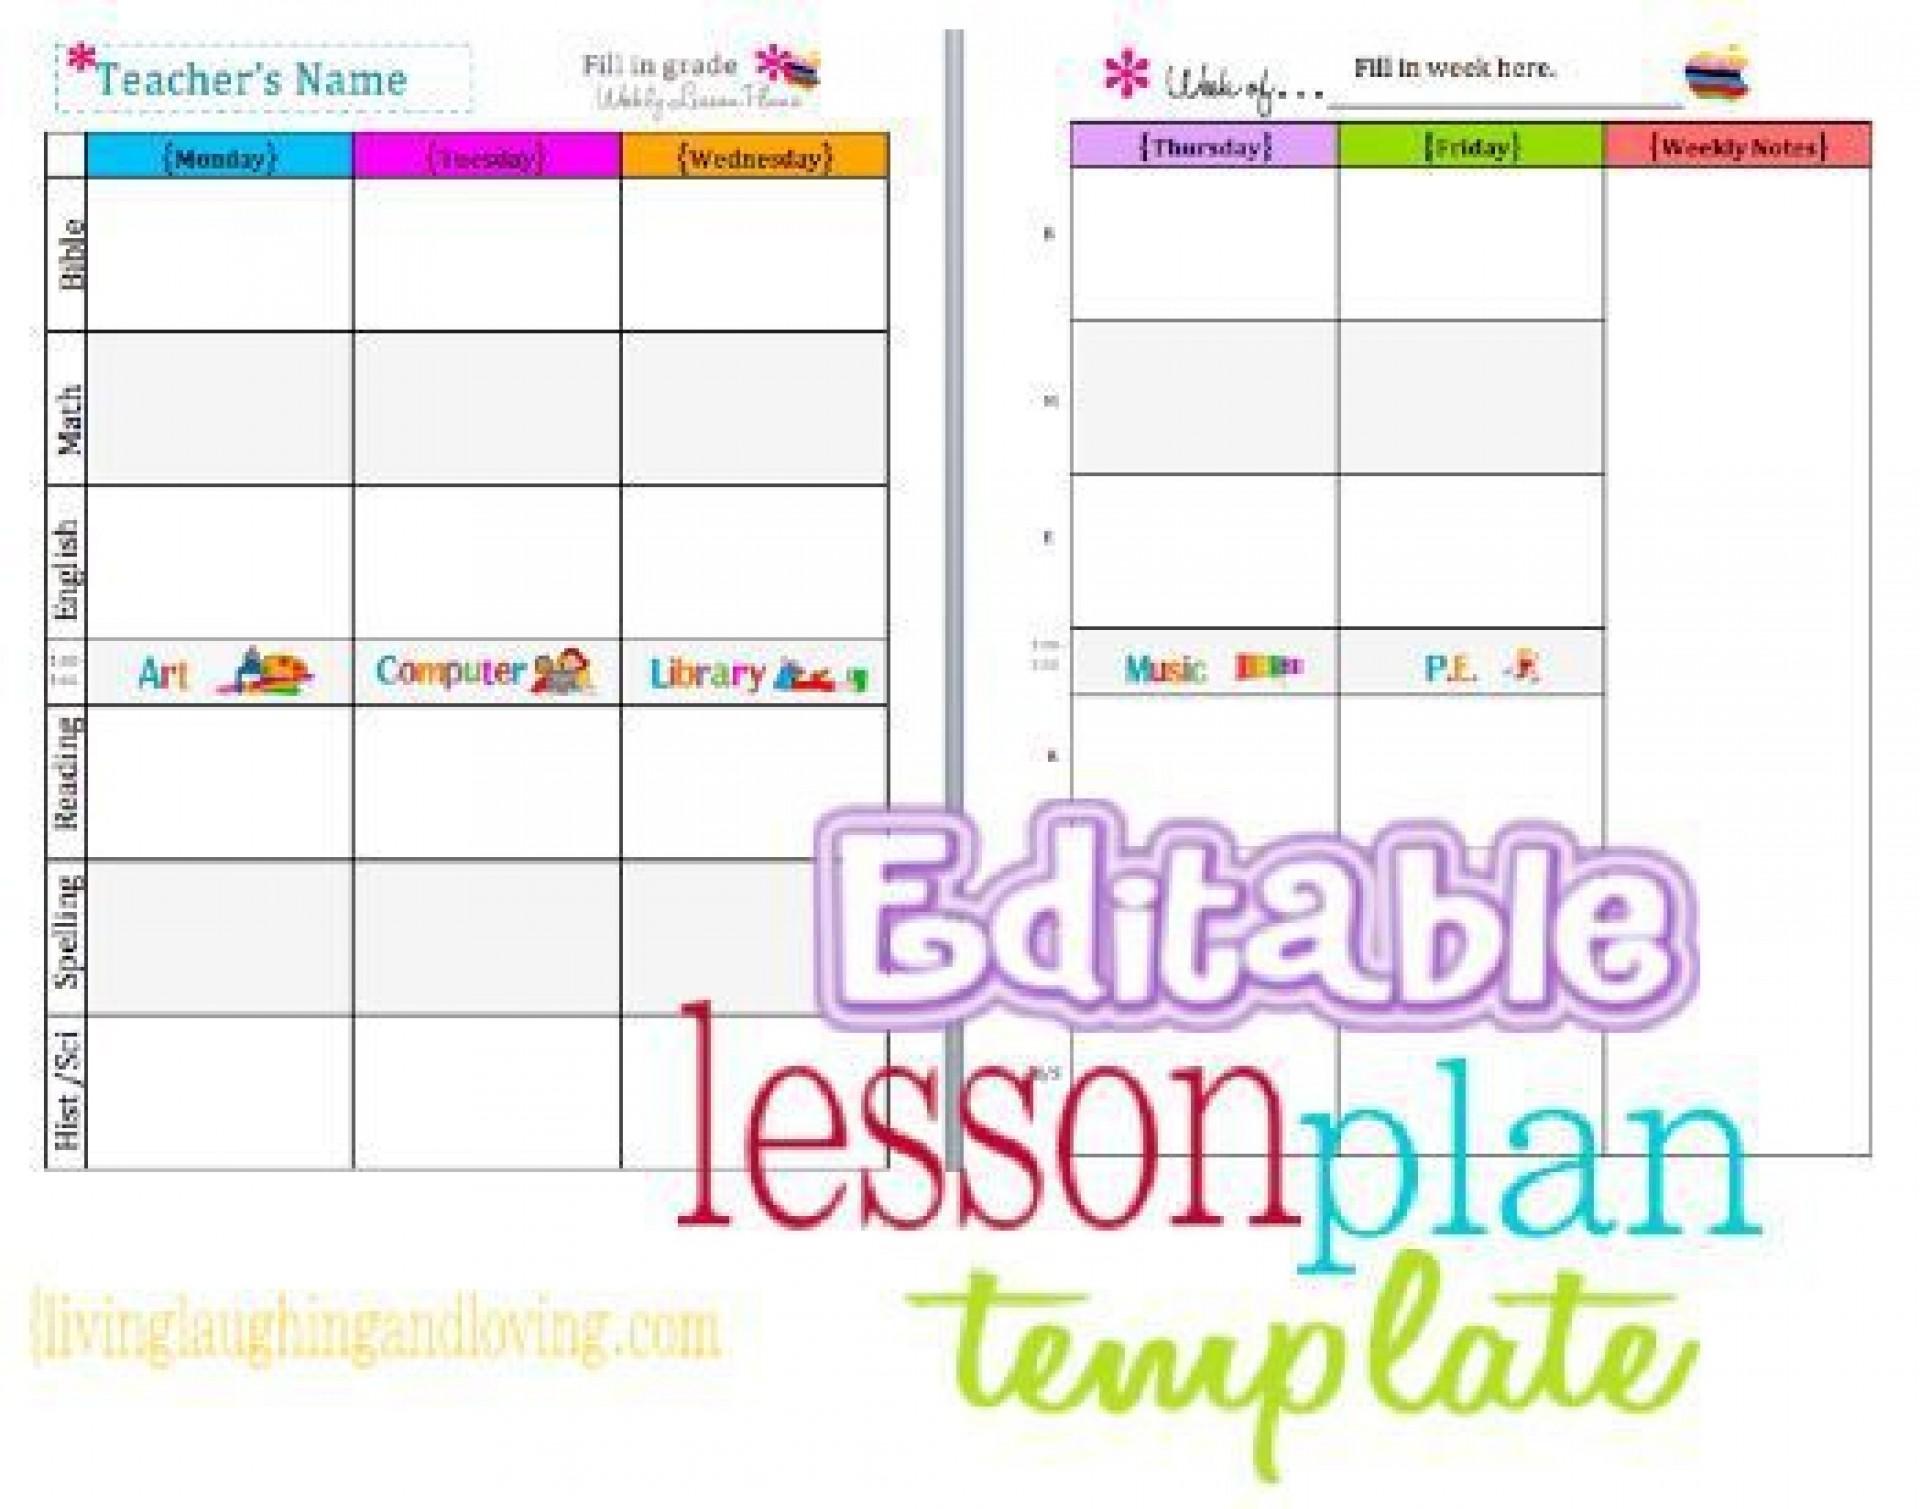 002 Simple Editable Lesson Plan Template Kindergarten High Def  Free1920